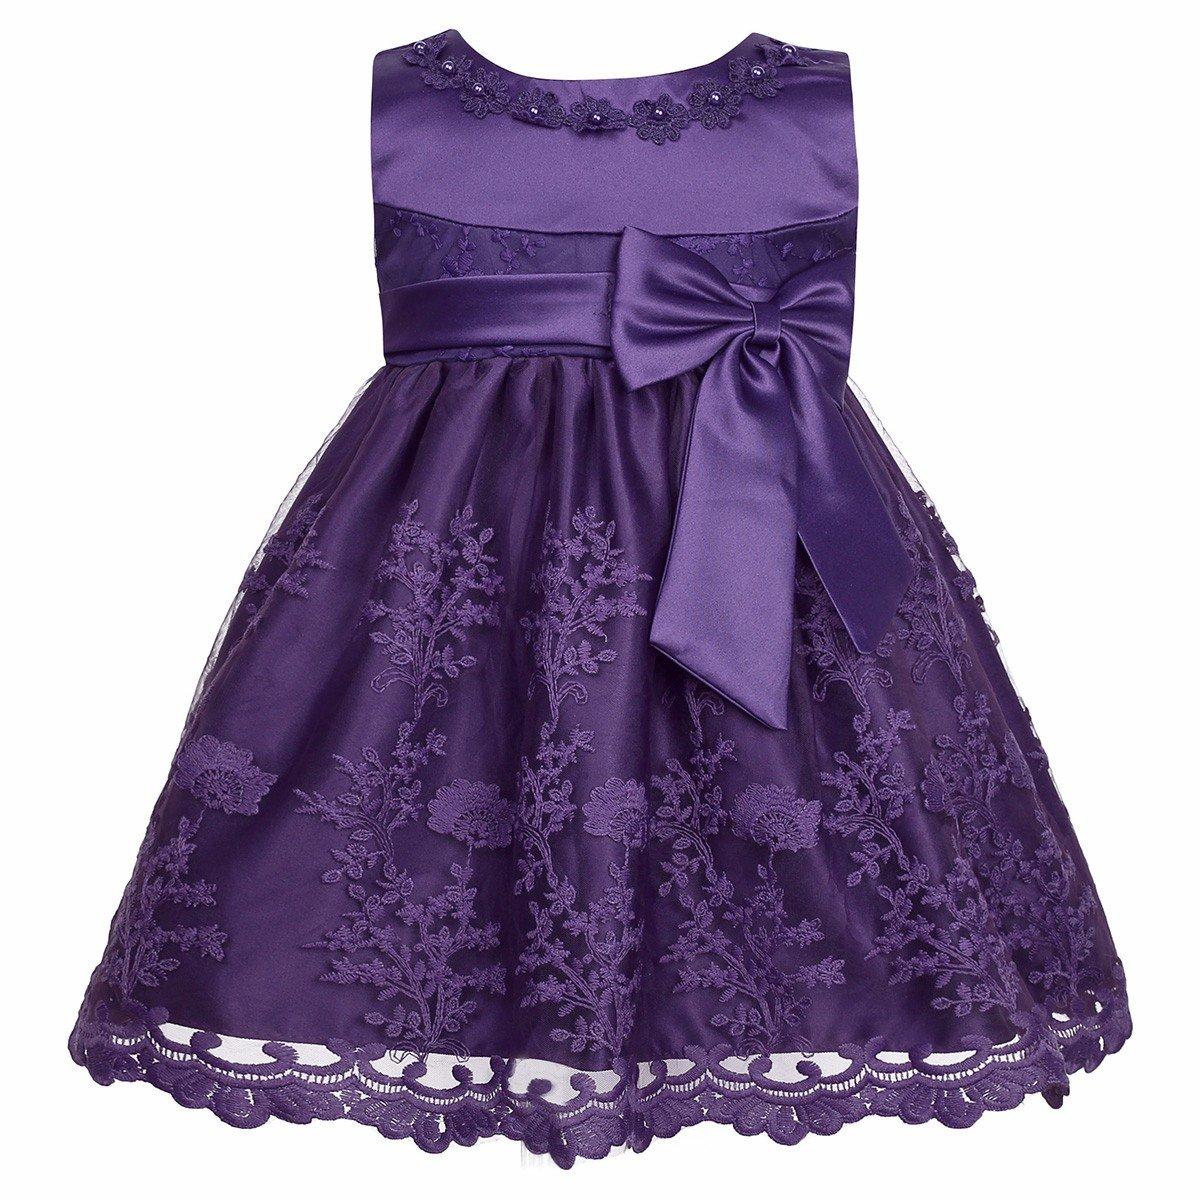 iiniim Baby Girls Toddlers Princess Rose Flower Bow Dress Wedding Bridesmaid Party Communion Dresses